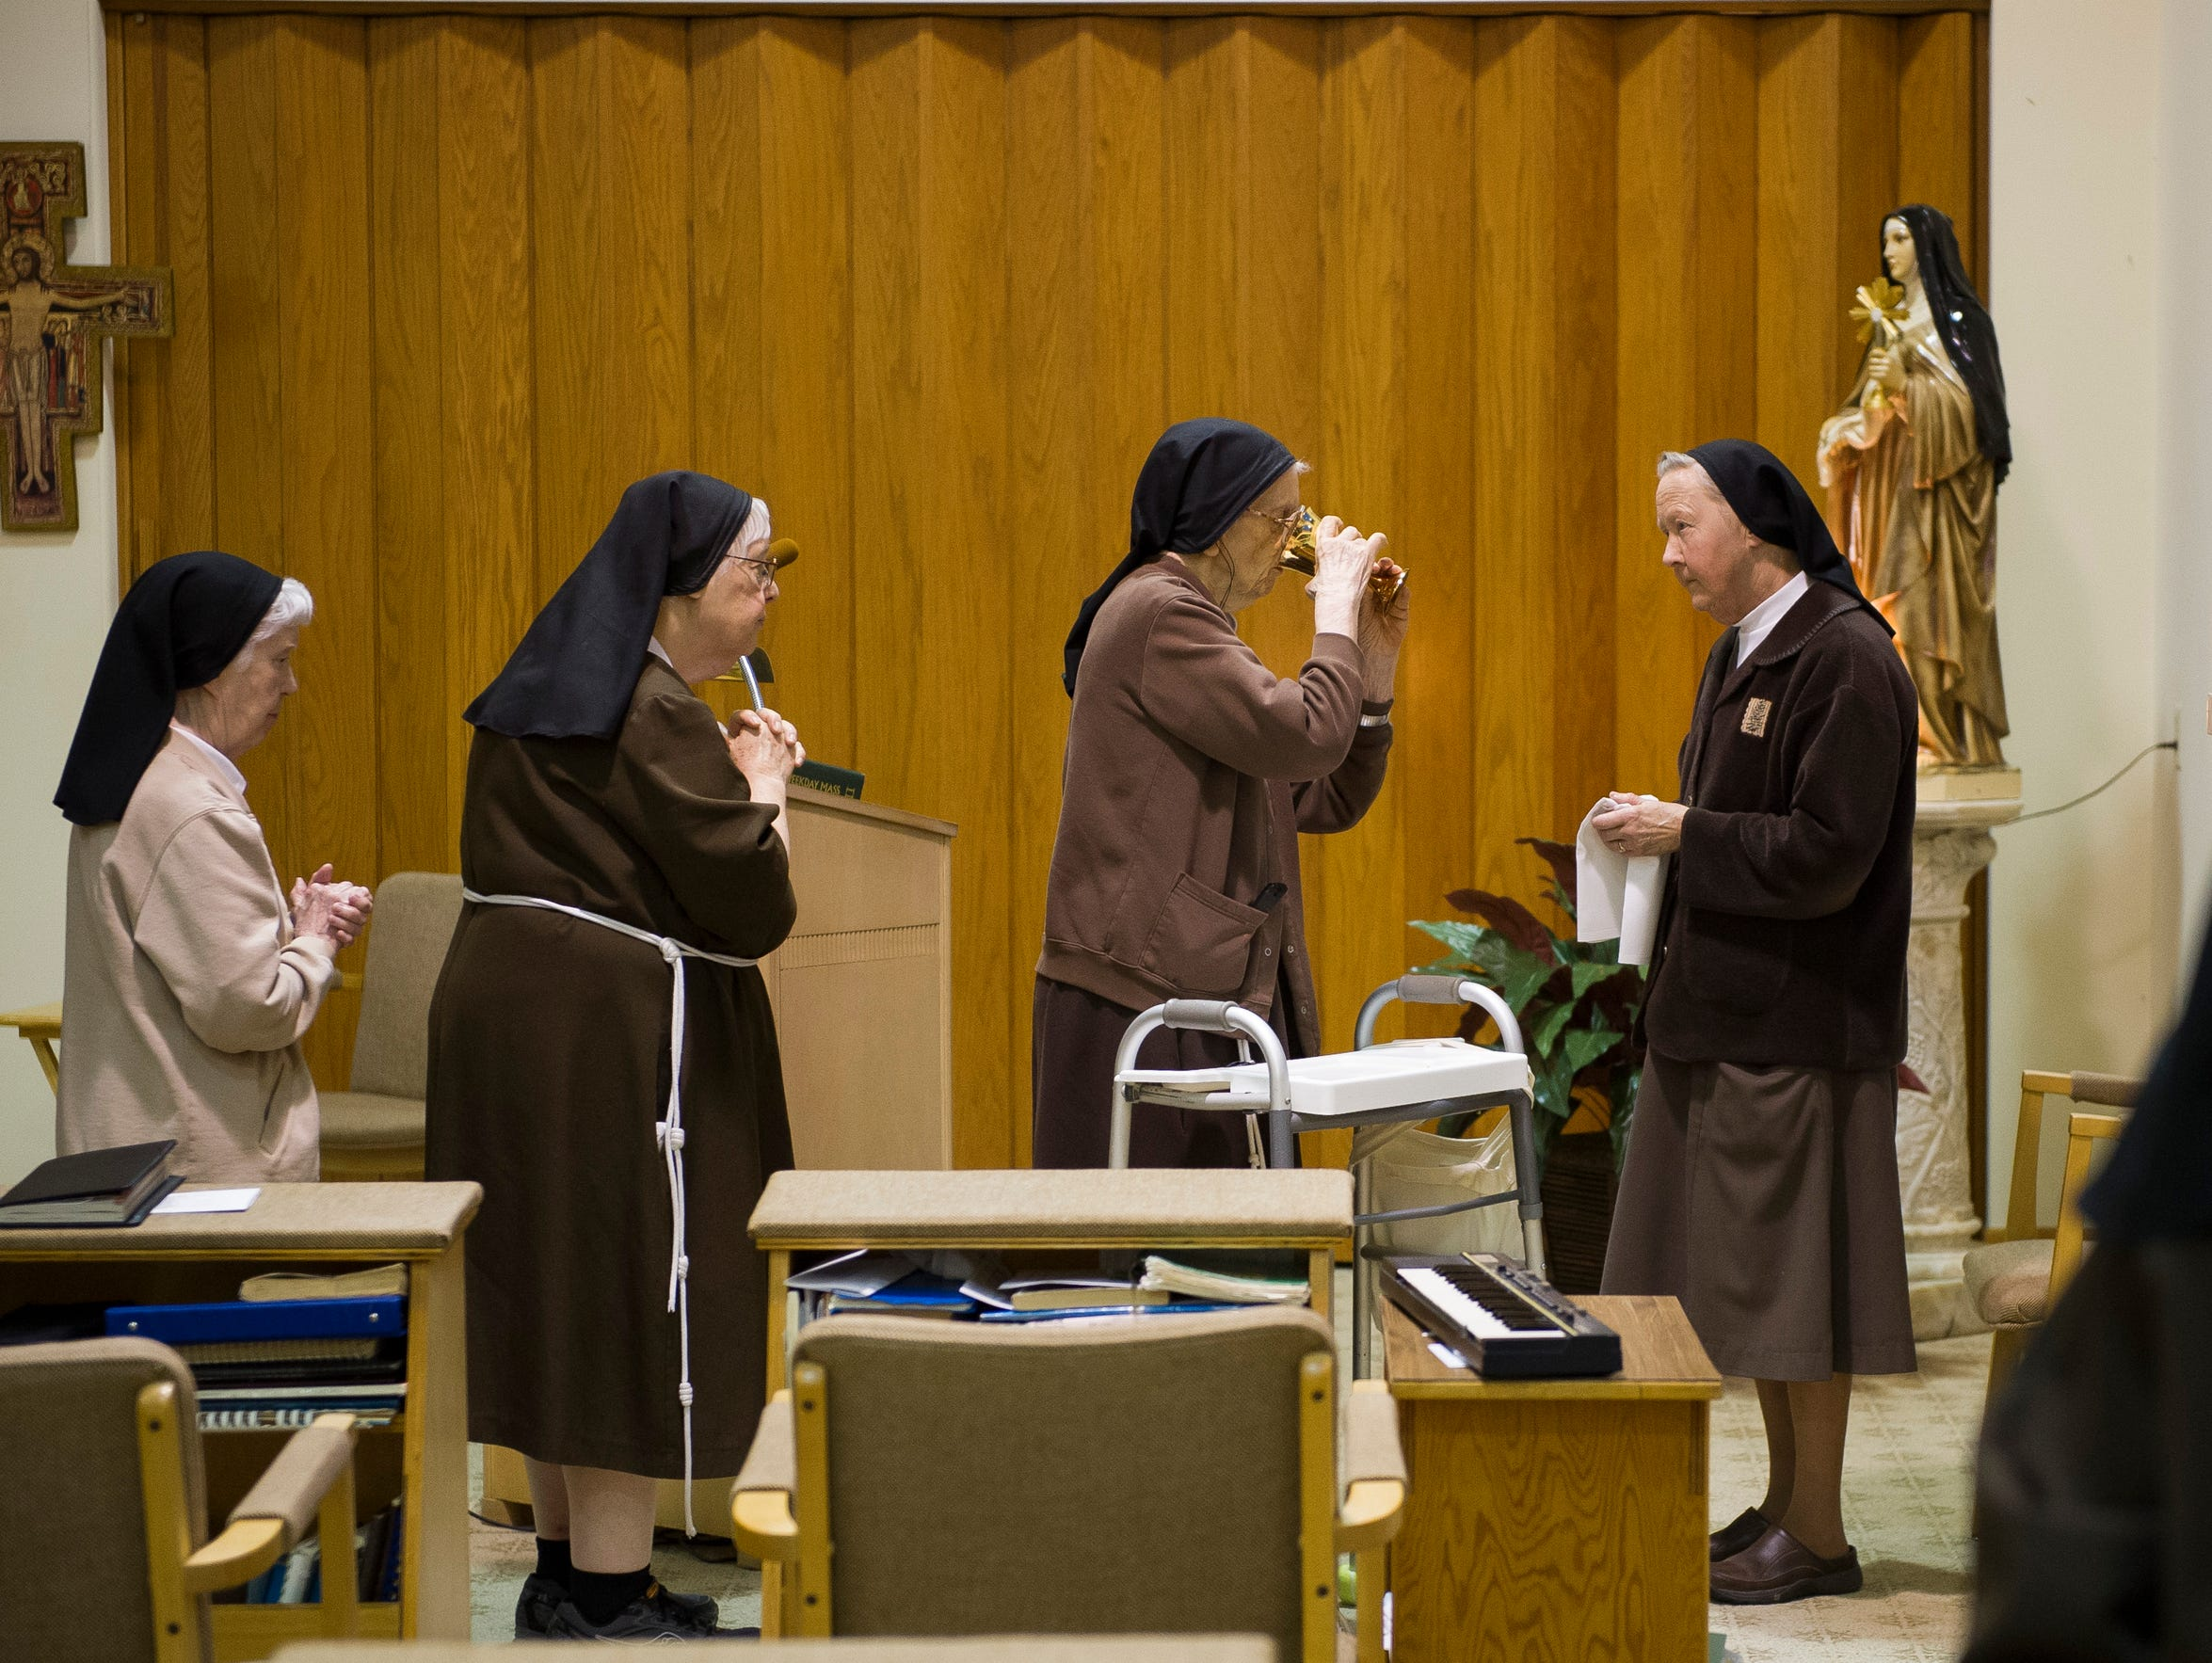 Sister Jane Marie DeLand, from left, Sister Catherine